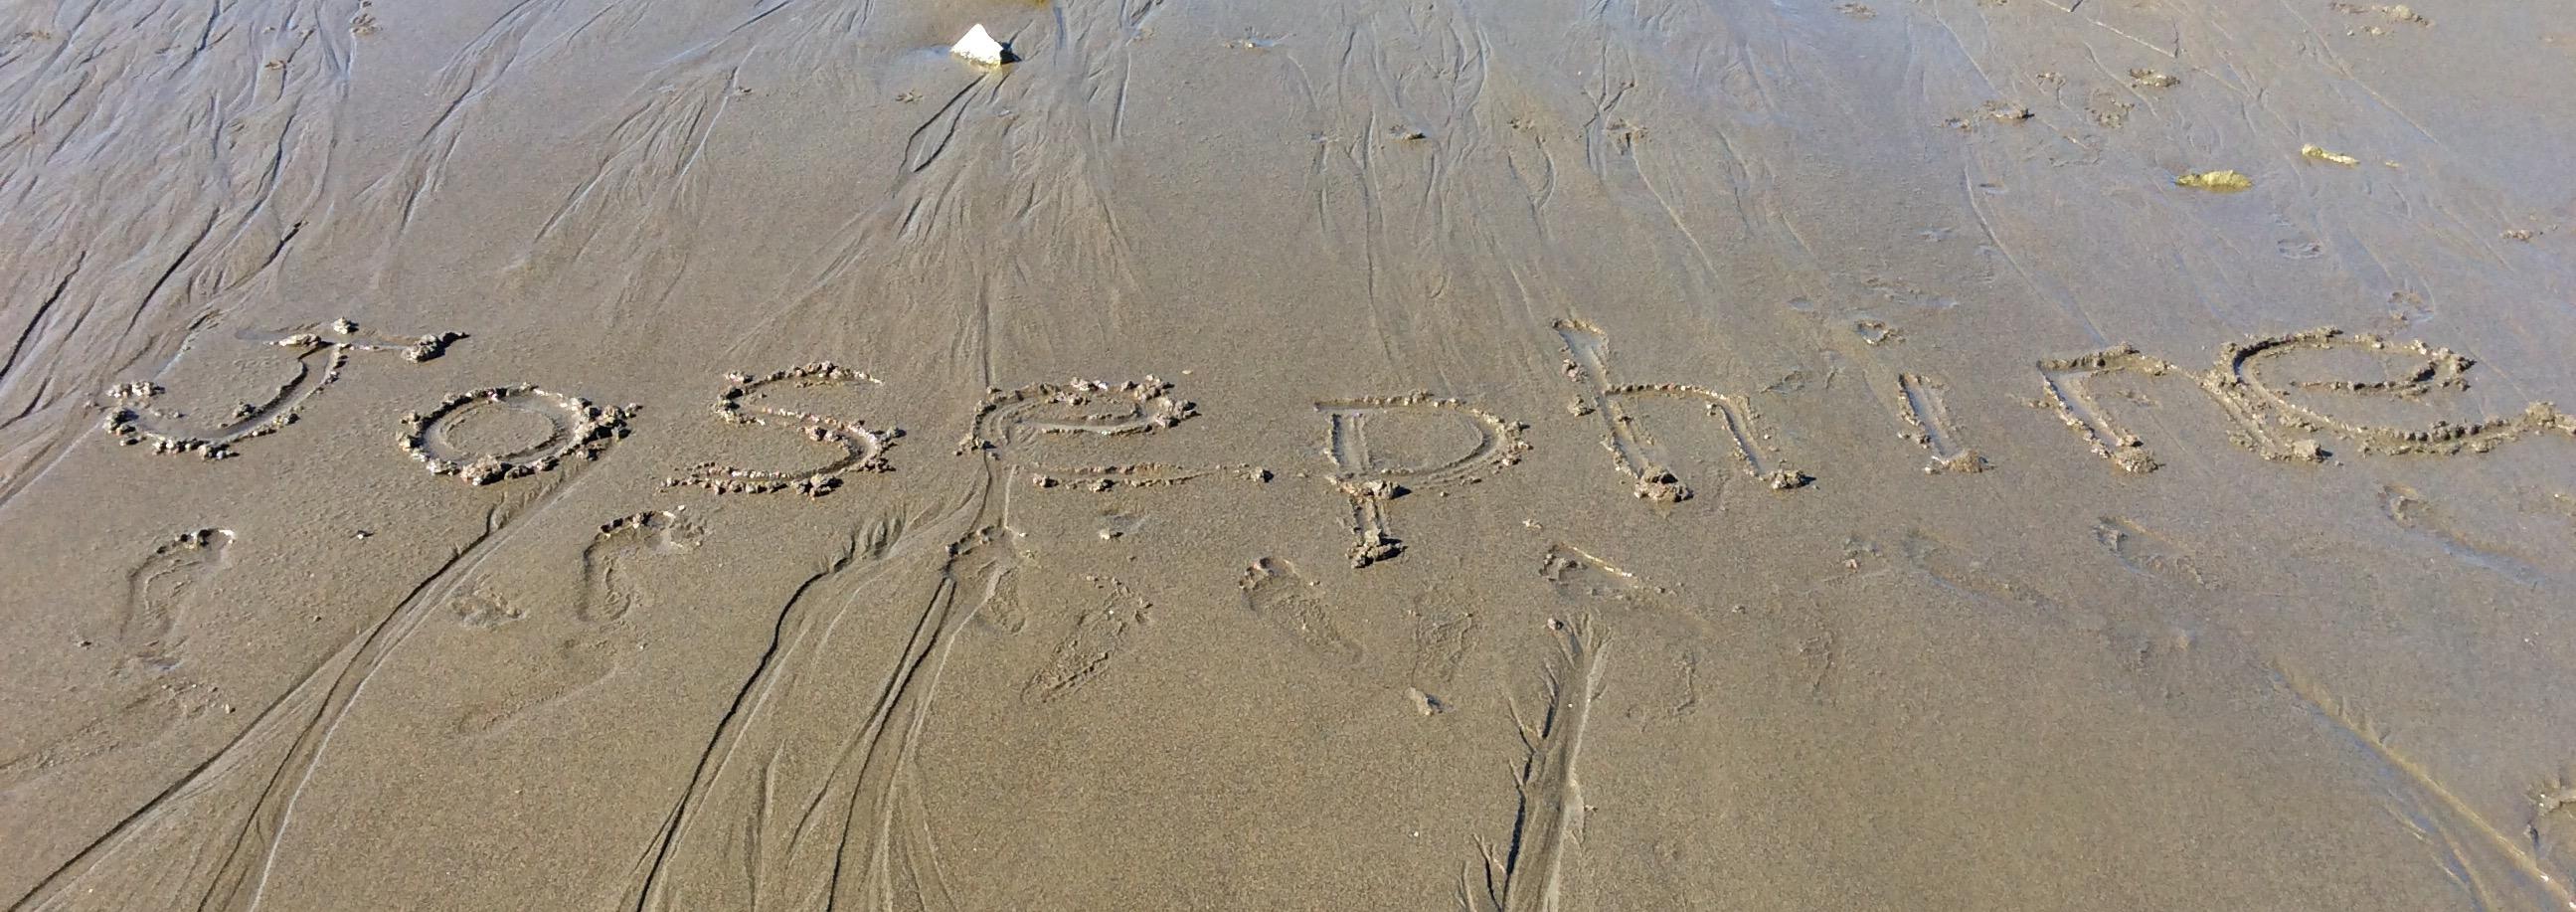 Sand - Still Born Alive